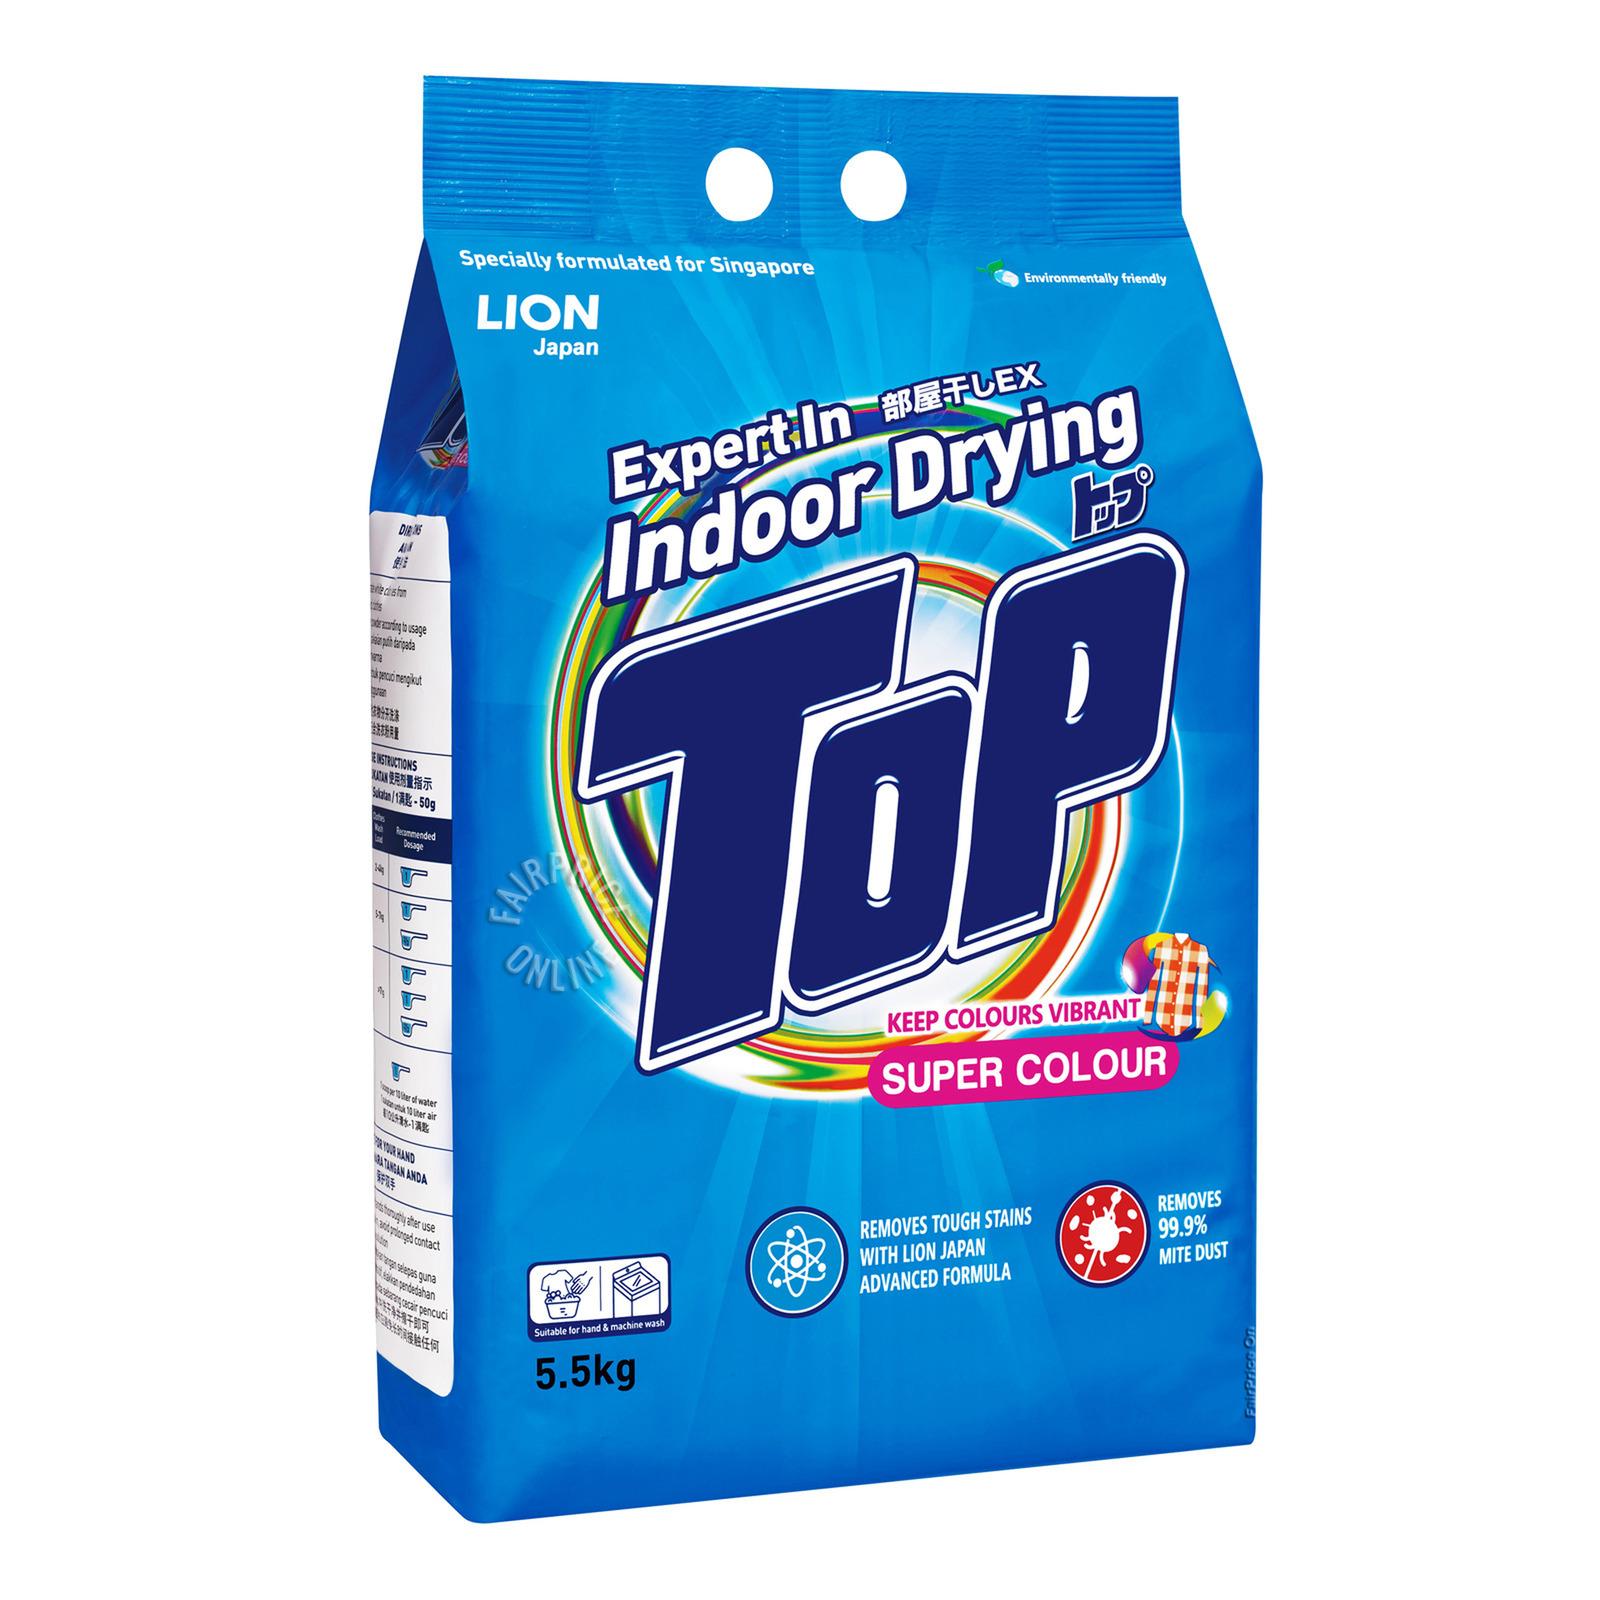 Top Detergent Powder - Super Colour